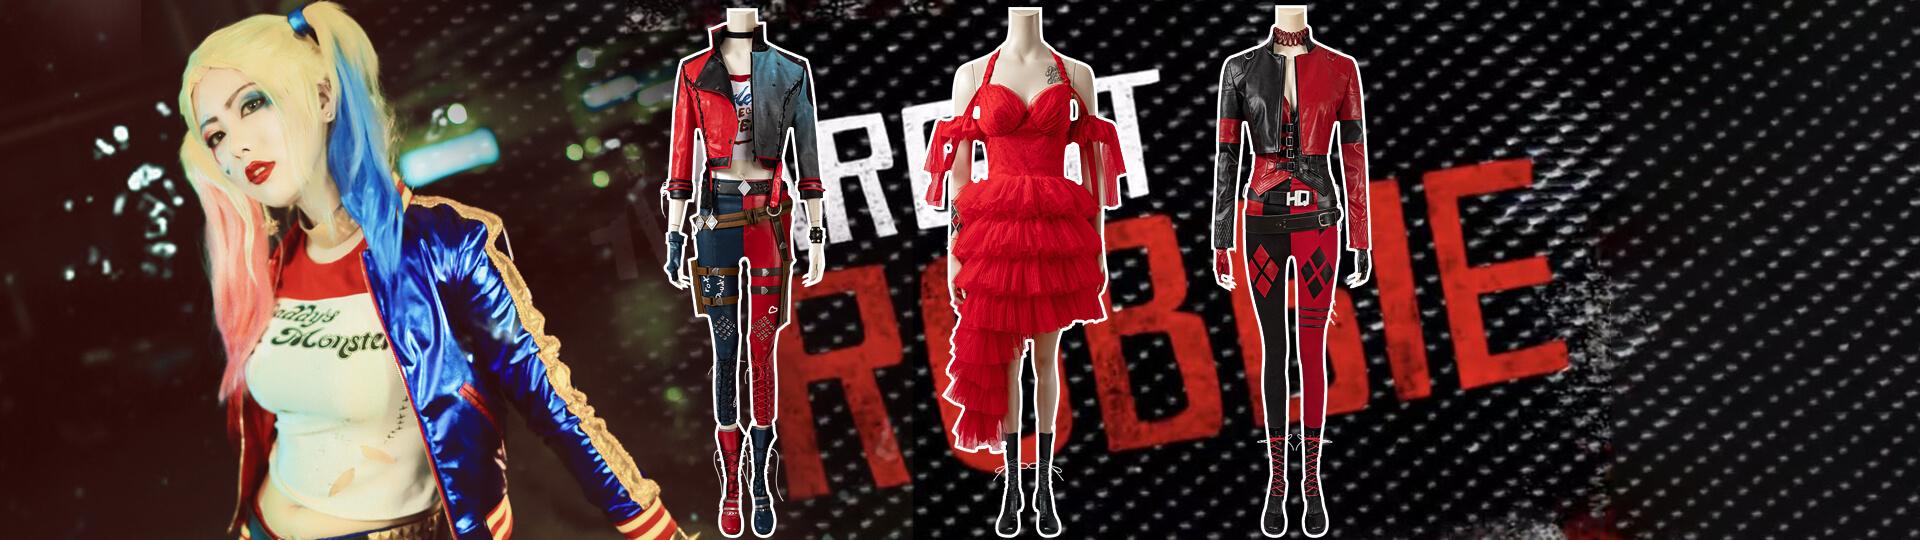 cosmanles harley quinn cosplay costumes